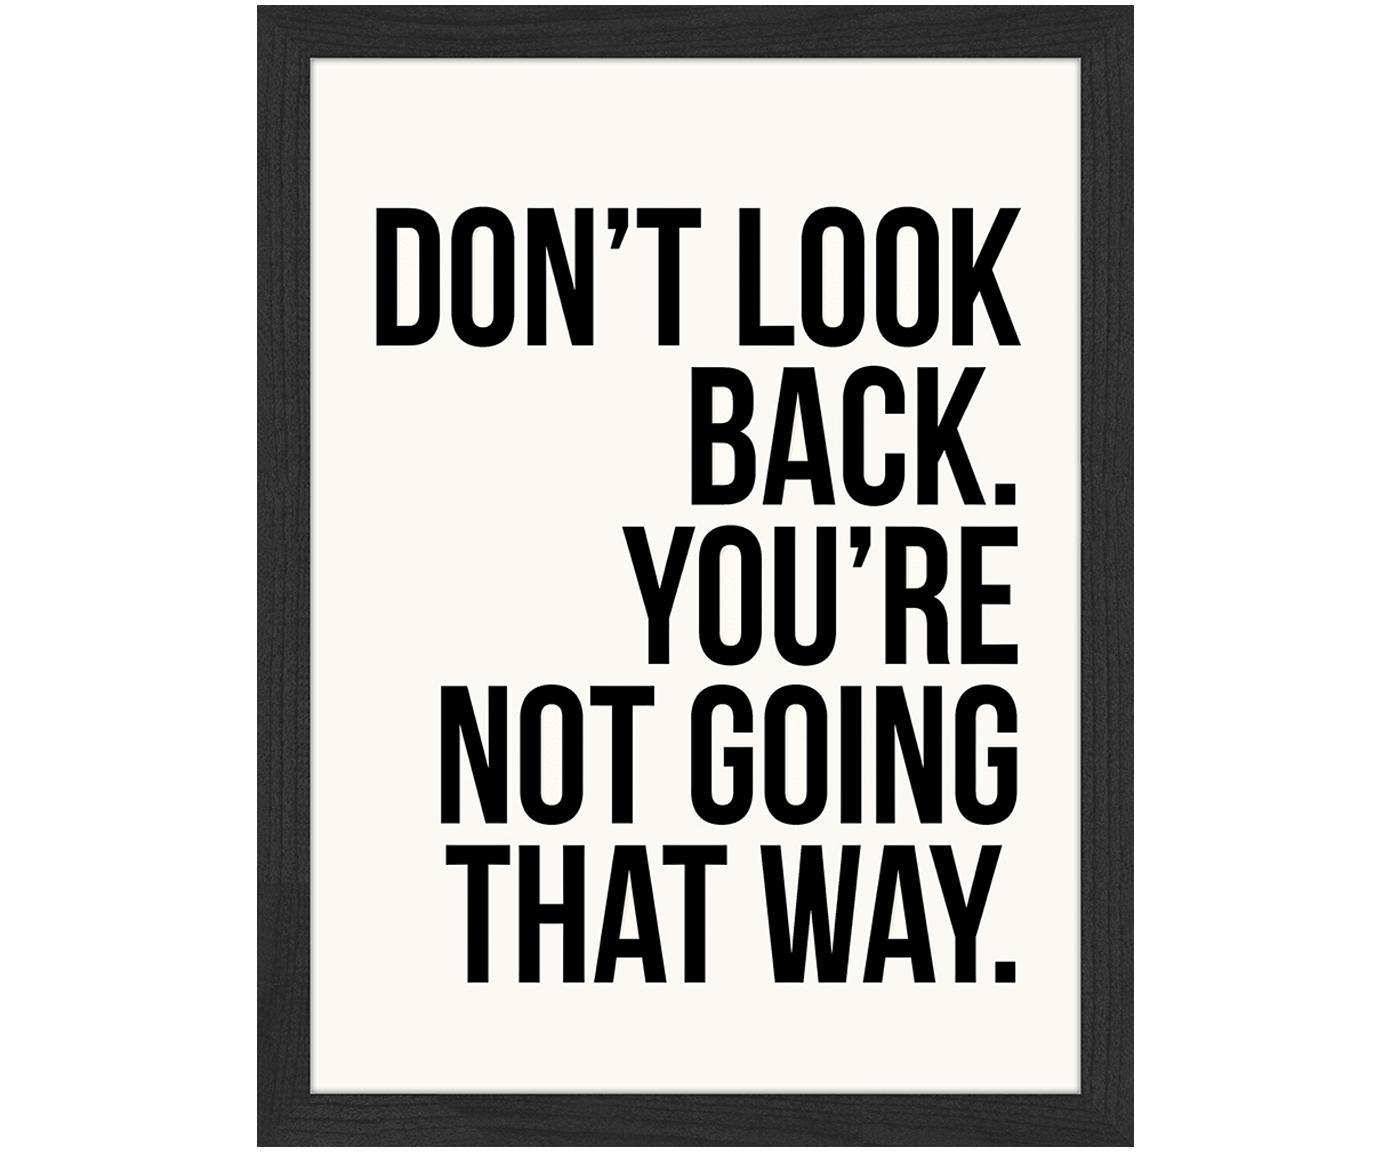 Stampa digitale incorniciata Don't Look Back, Immagine: stampa digitale su carta,, Cornice: legno verniciato, Immagine: nero, bianco cornice: nero, Larg. 33 x Alt.43 cm